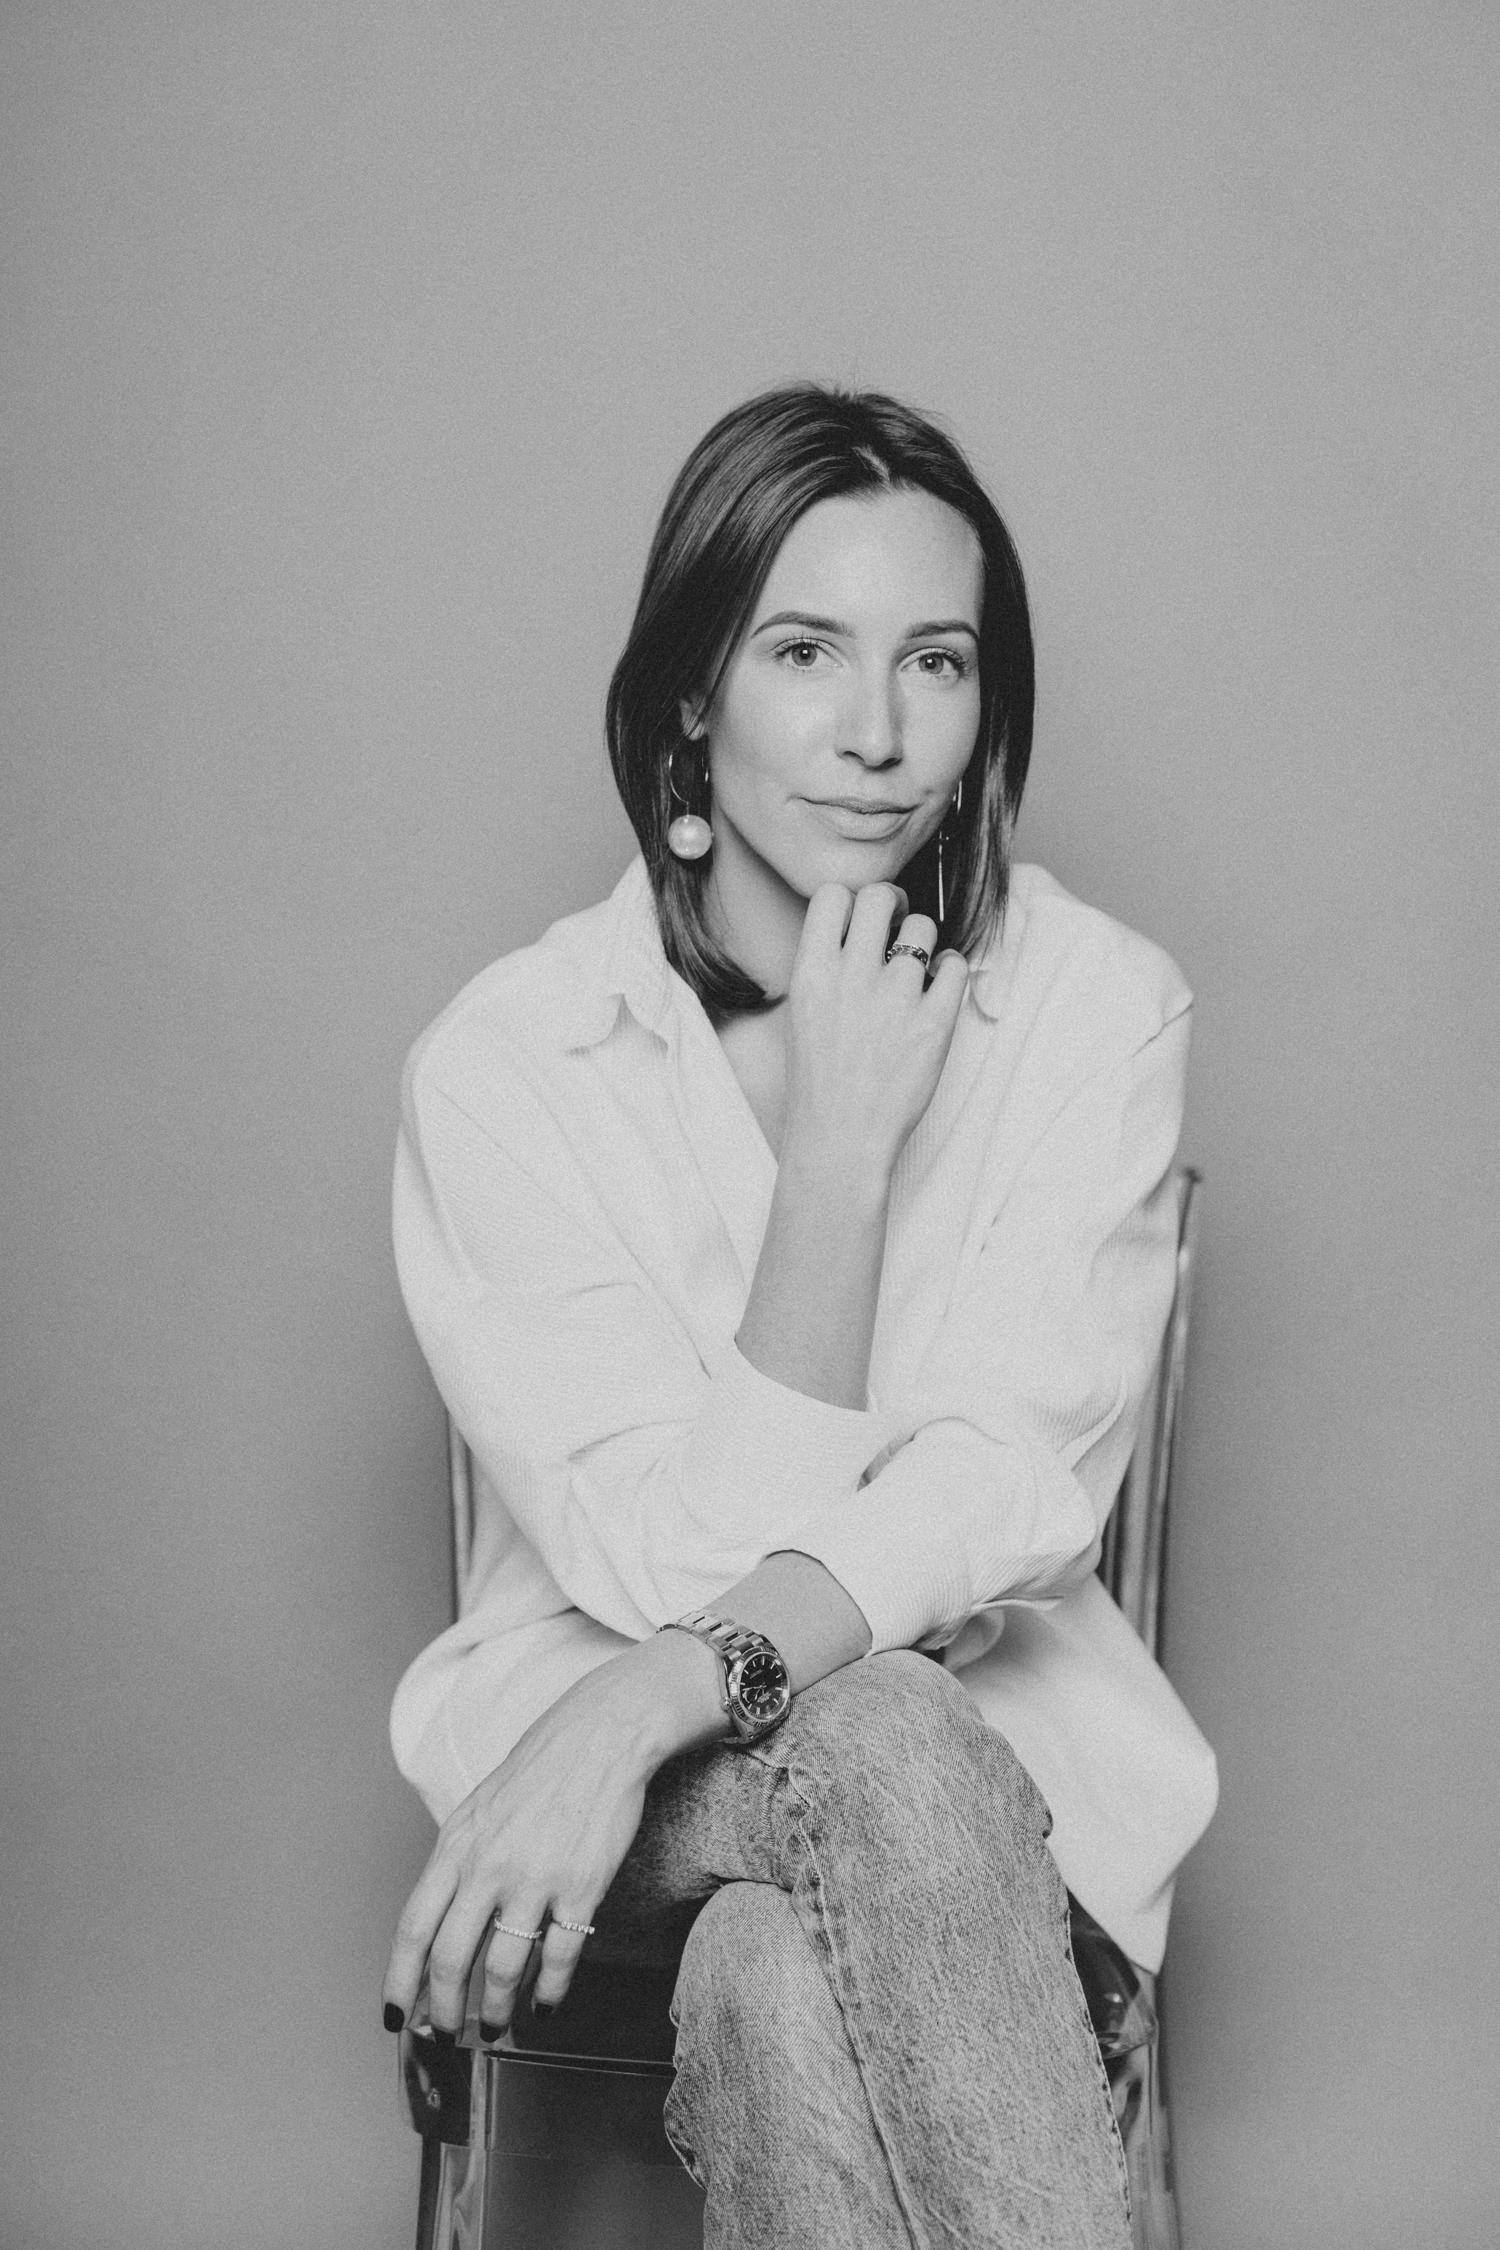 The Daily Dose: Katharina Hingsammer, Founder - Love Daily Dose